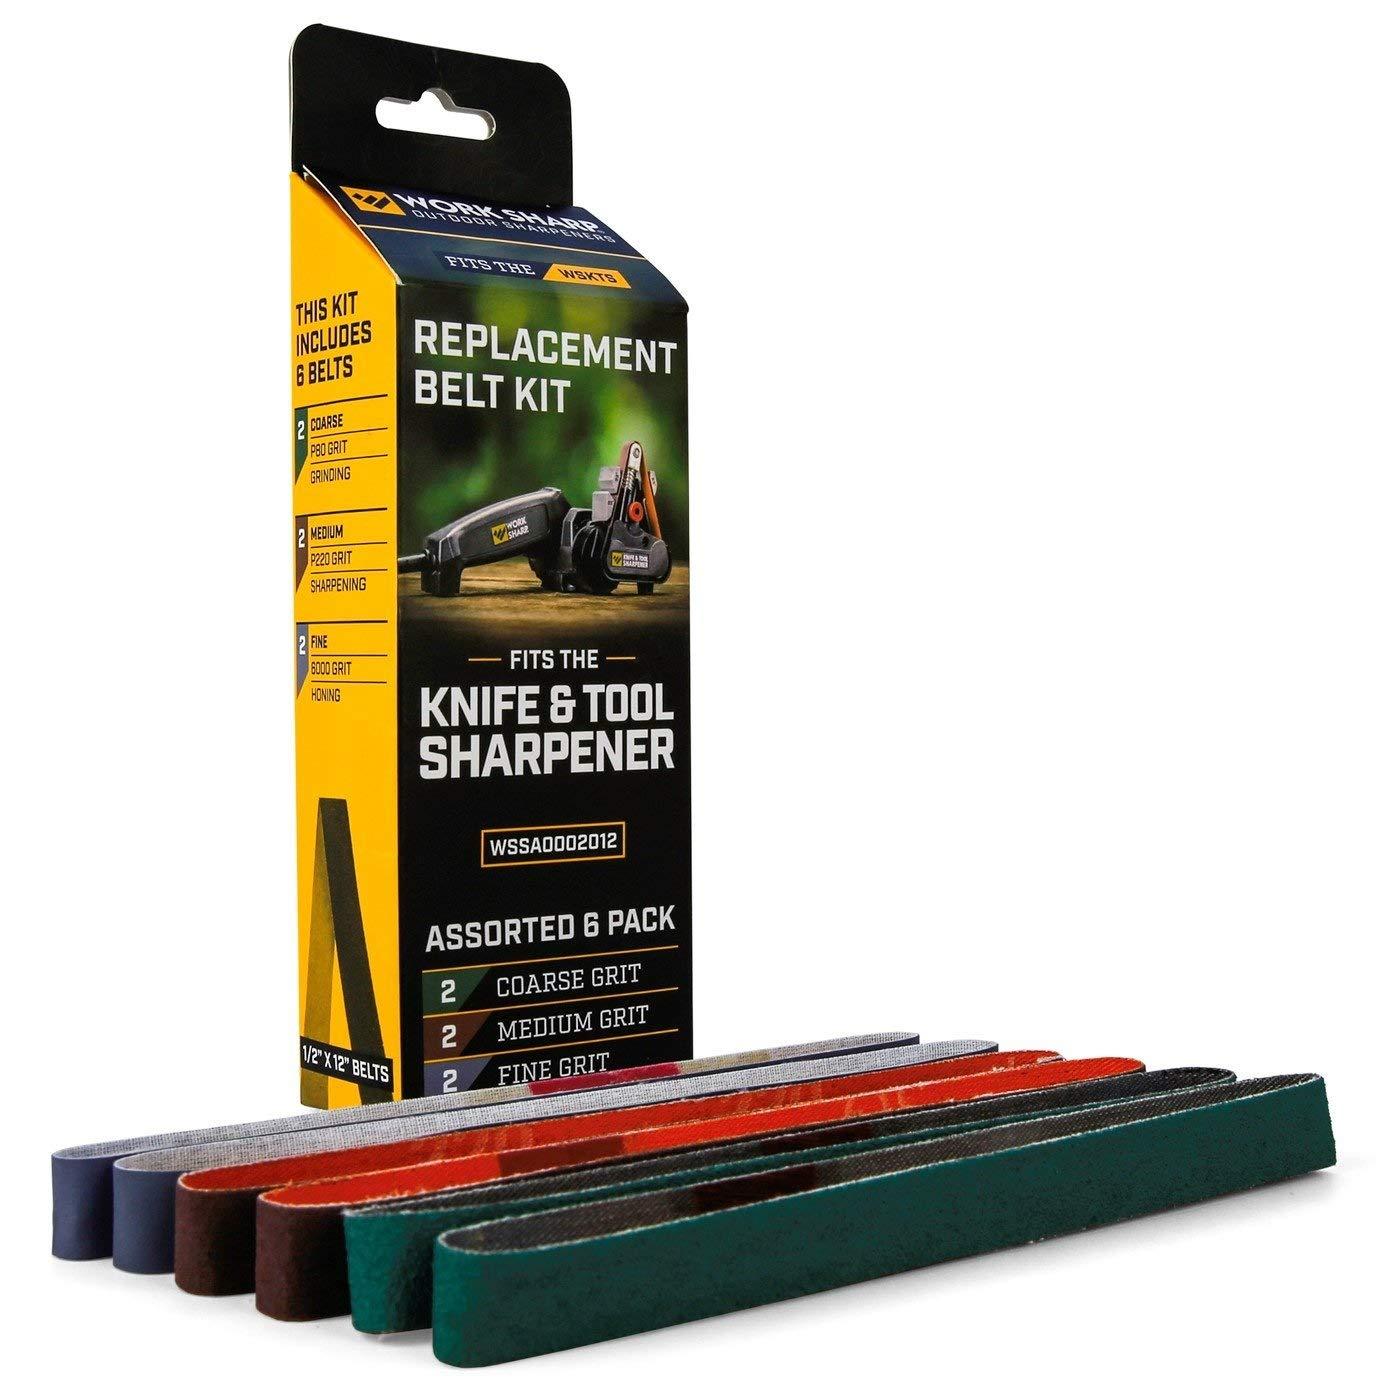 Amazon.com: Kit de reemplazo de correa para cuchillo afilado ...